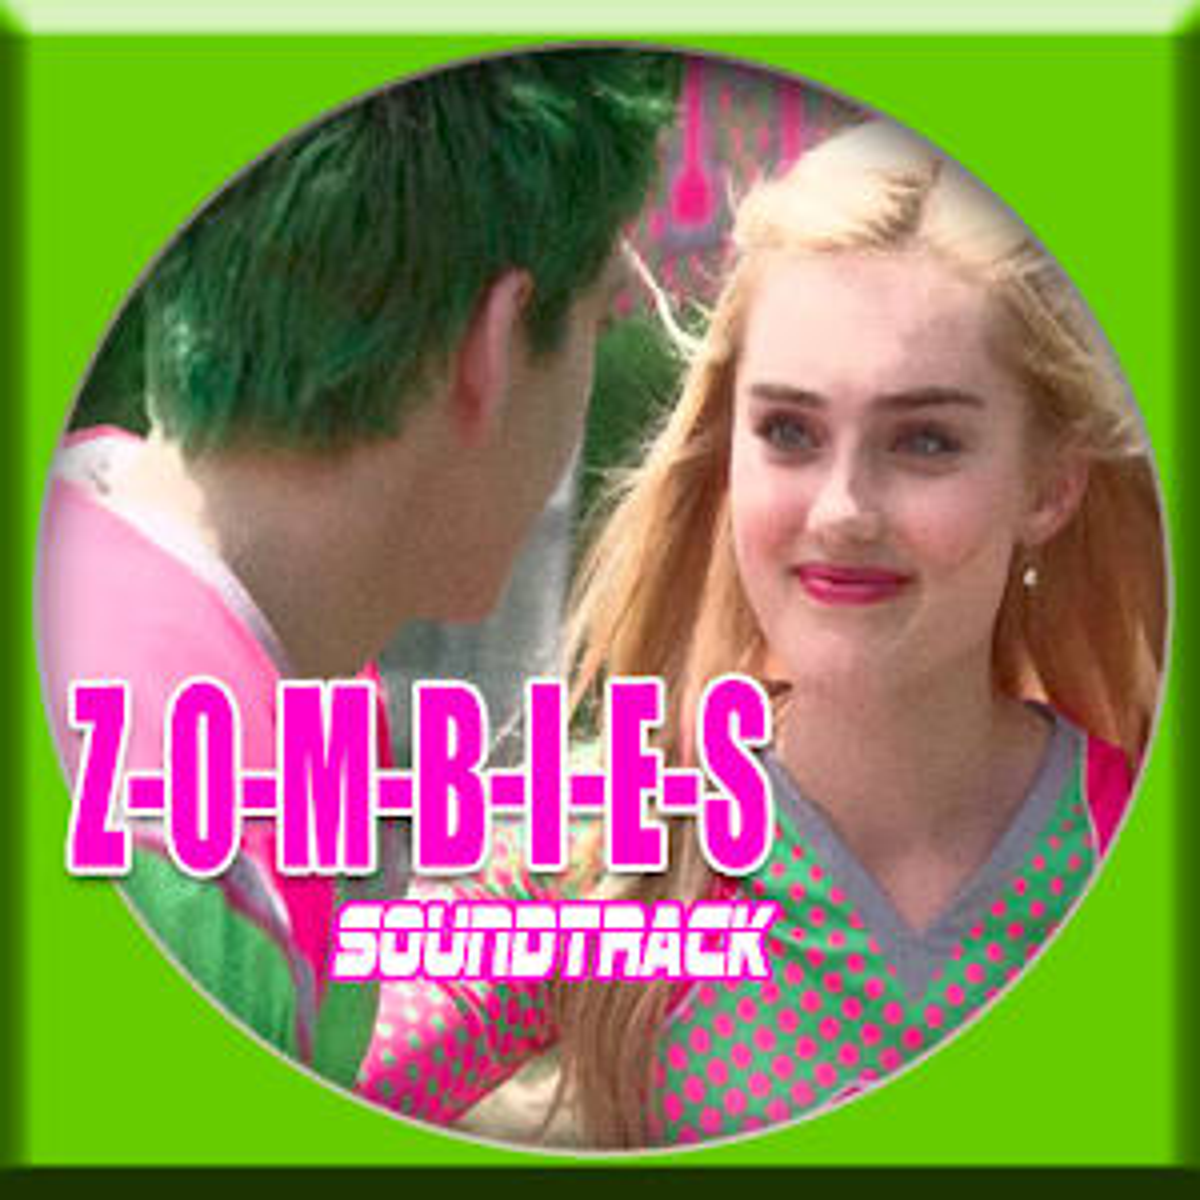 Zombies Soundtrack